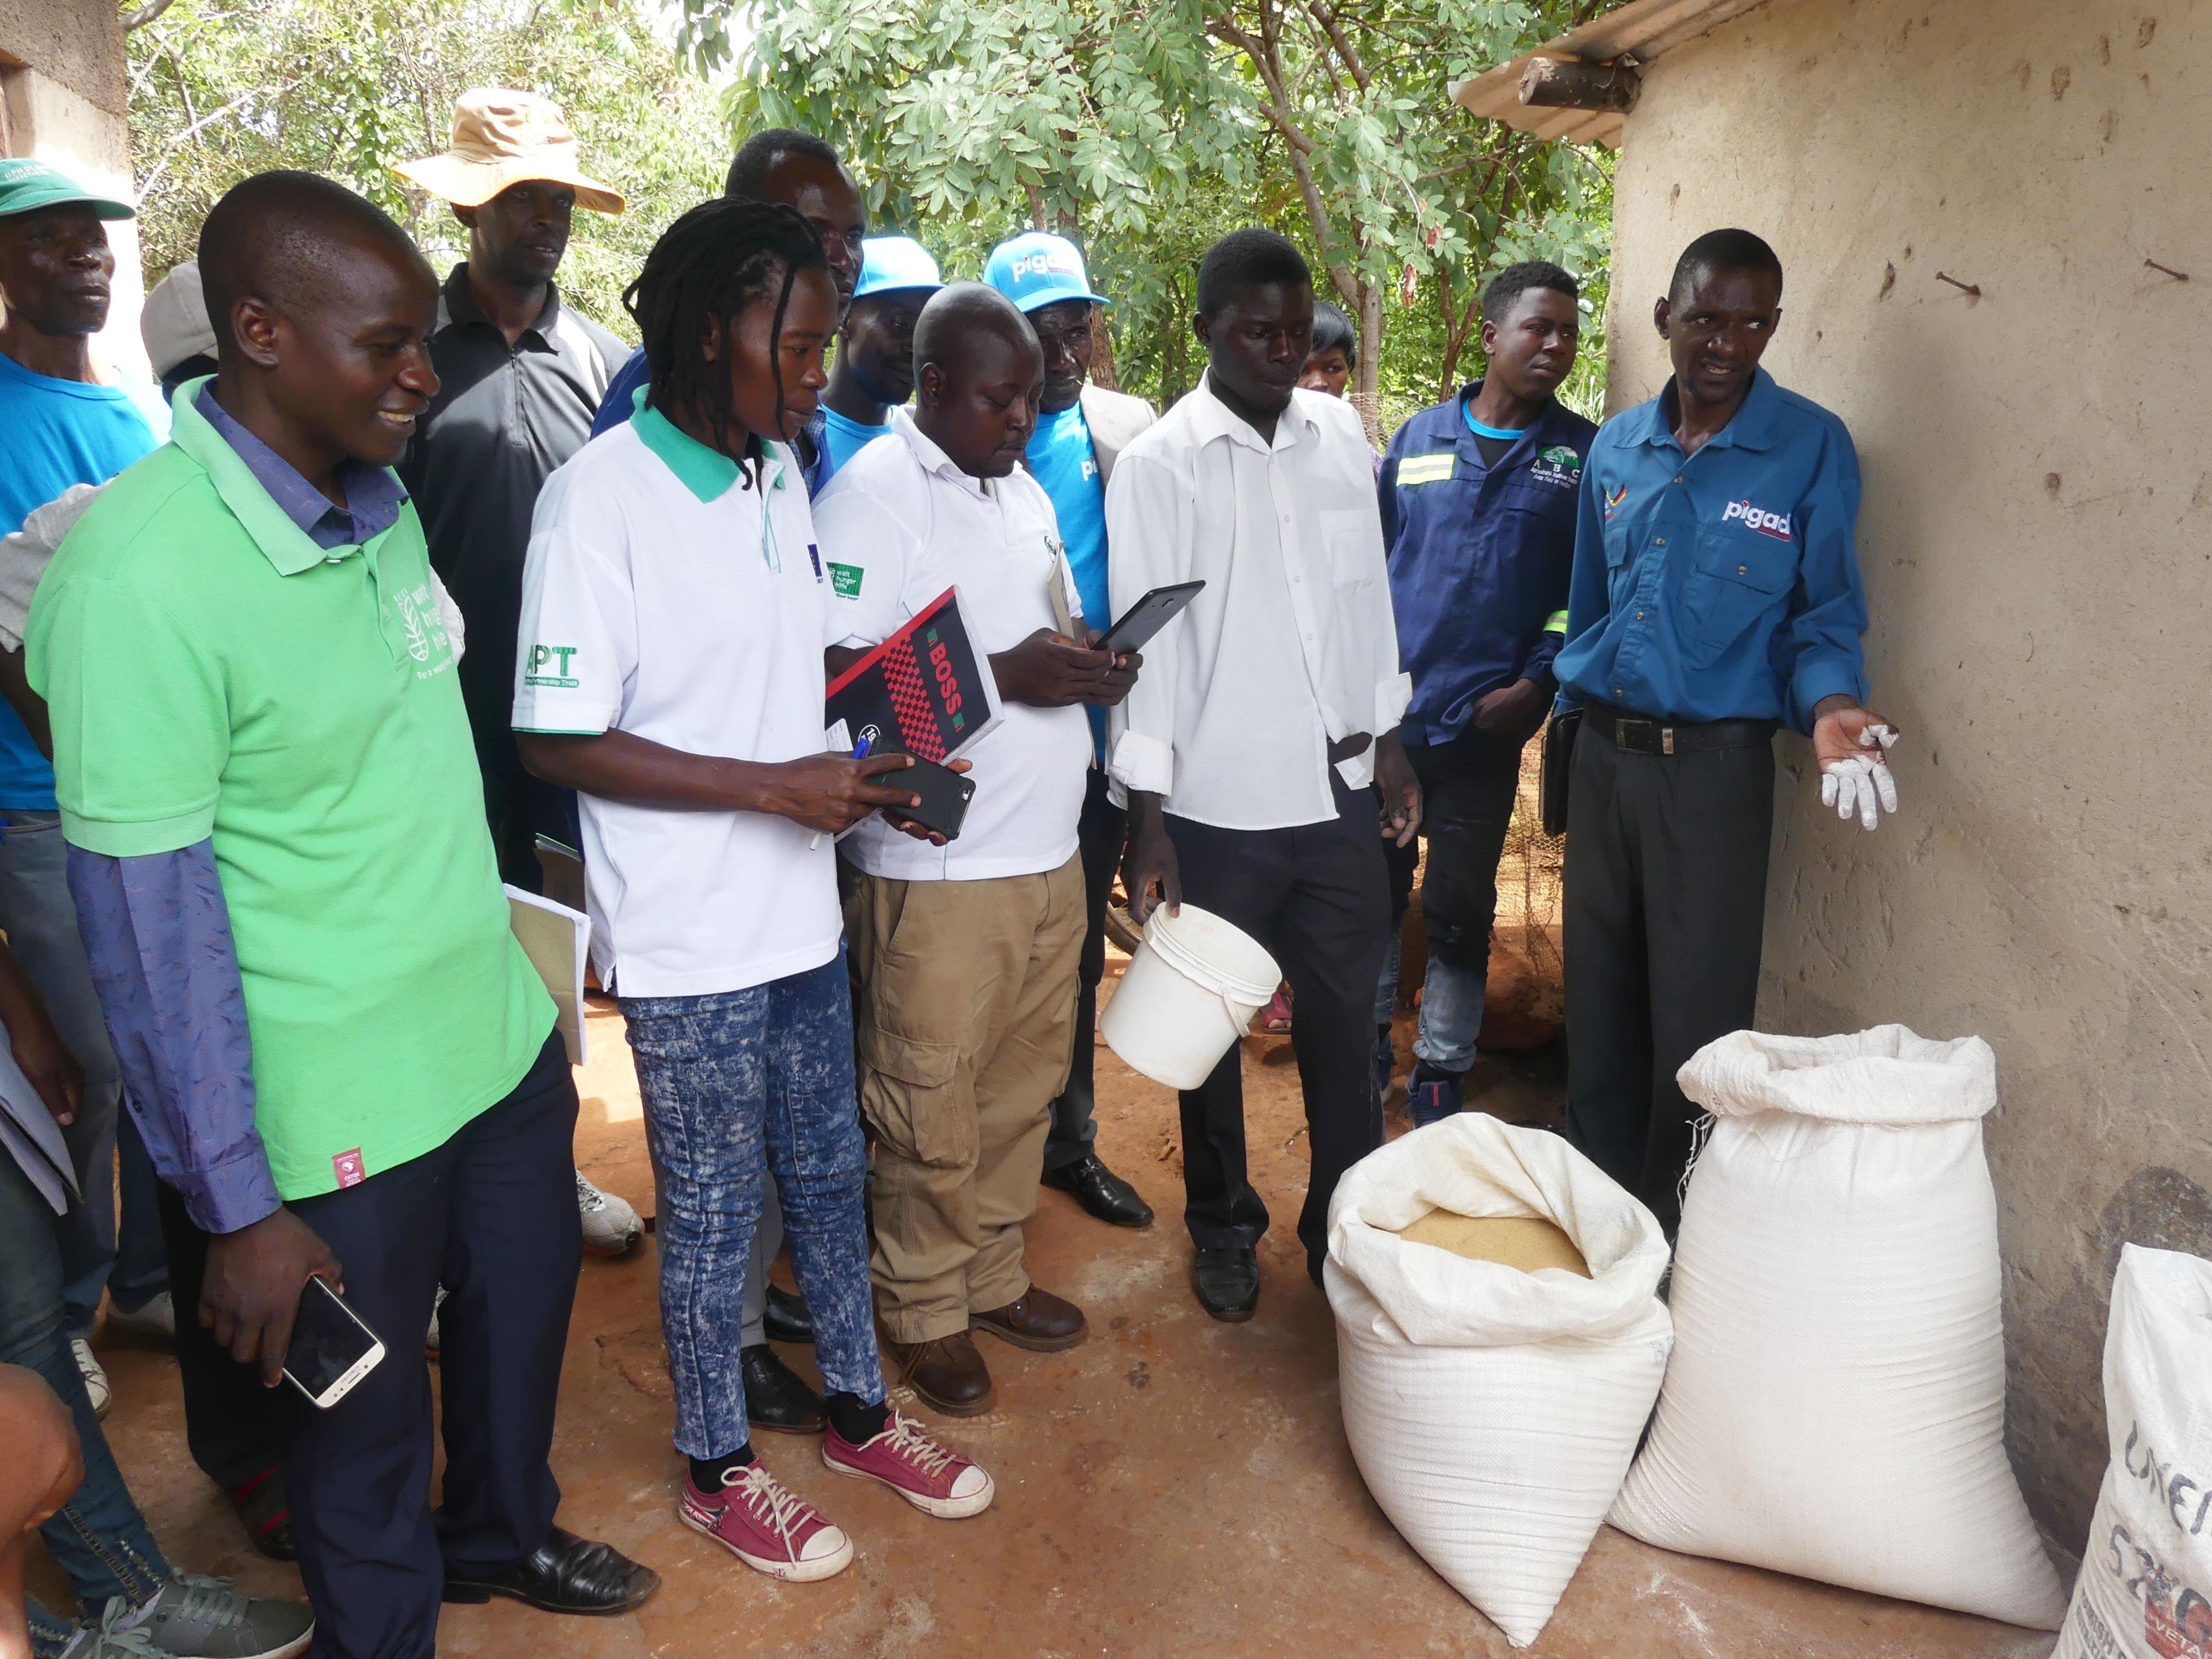 Gokwe smallholder poultry farmers visit Goromonzi